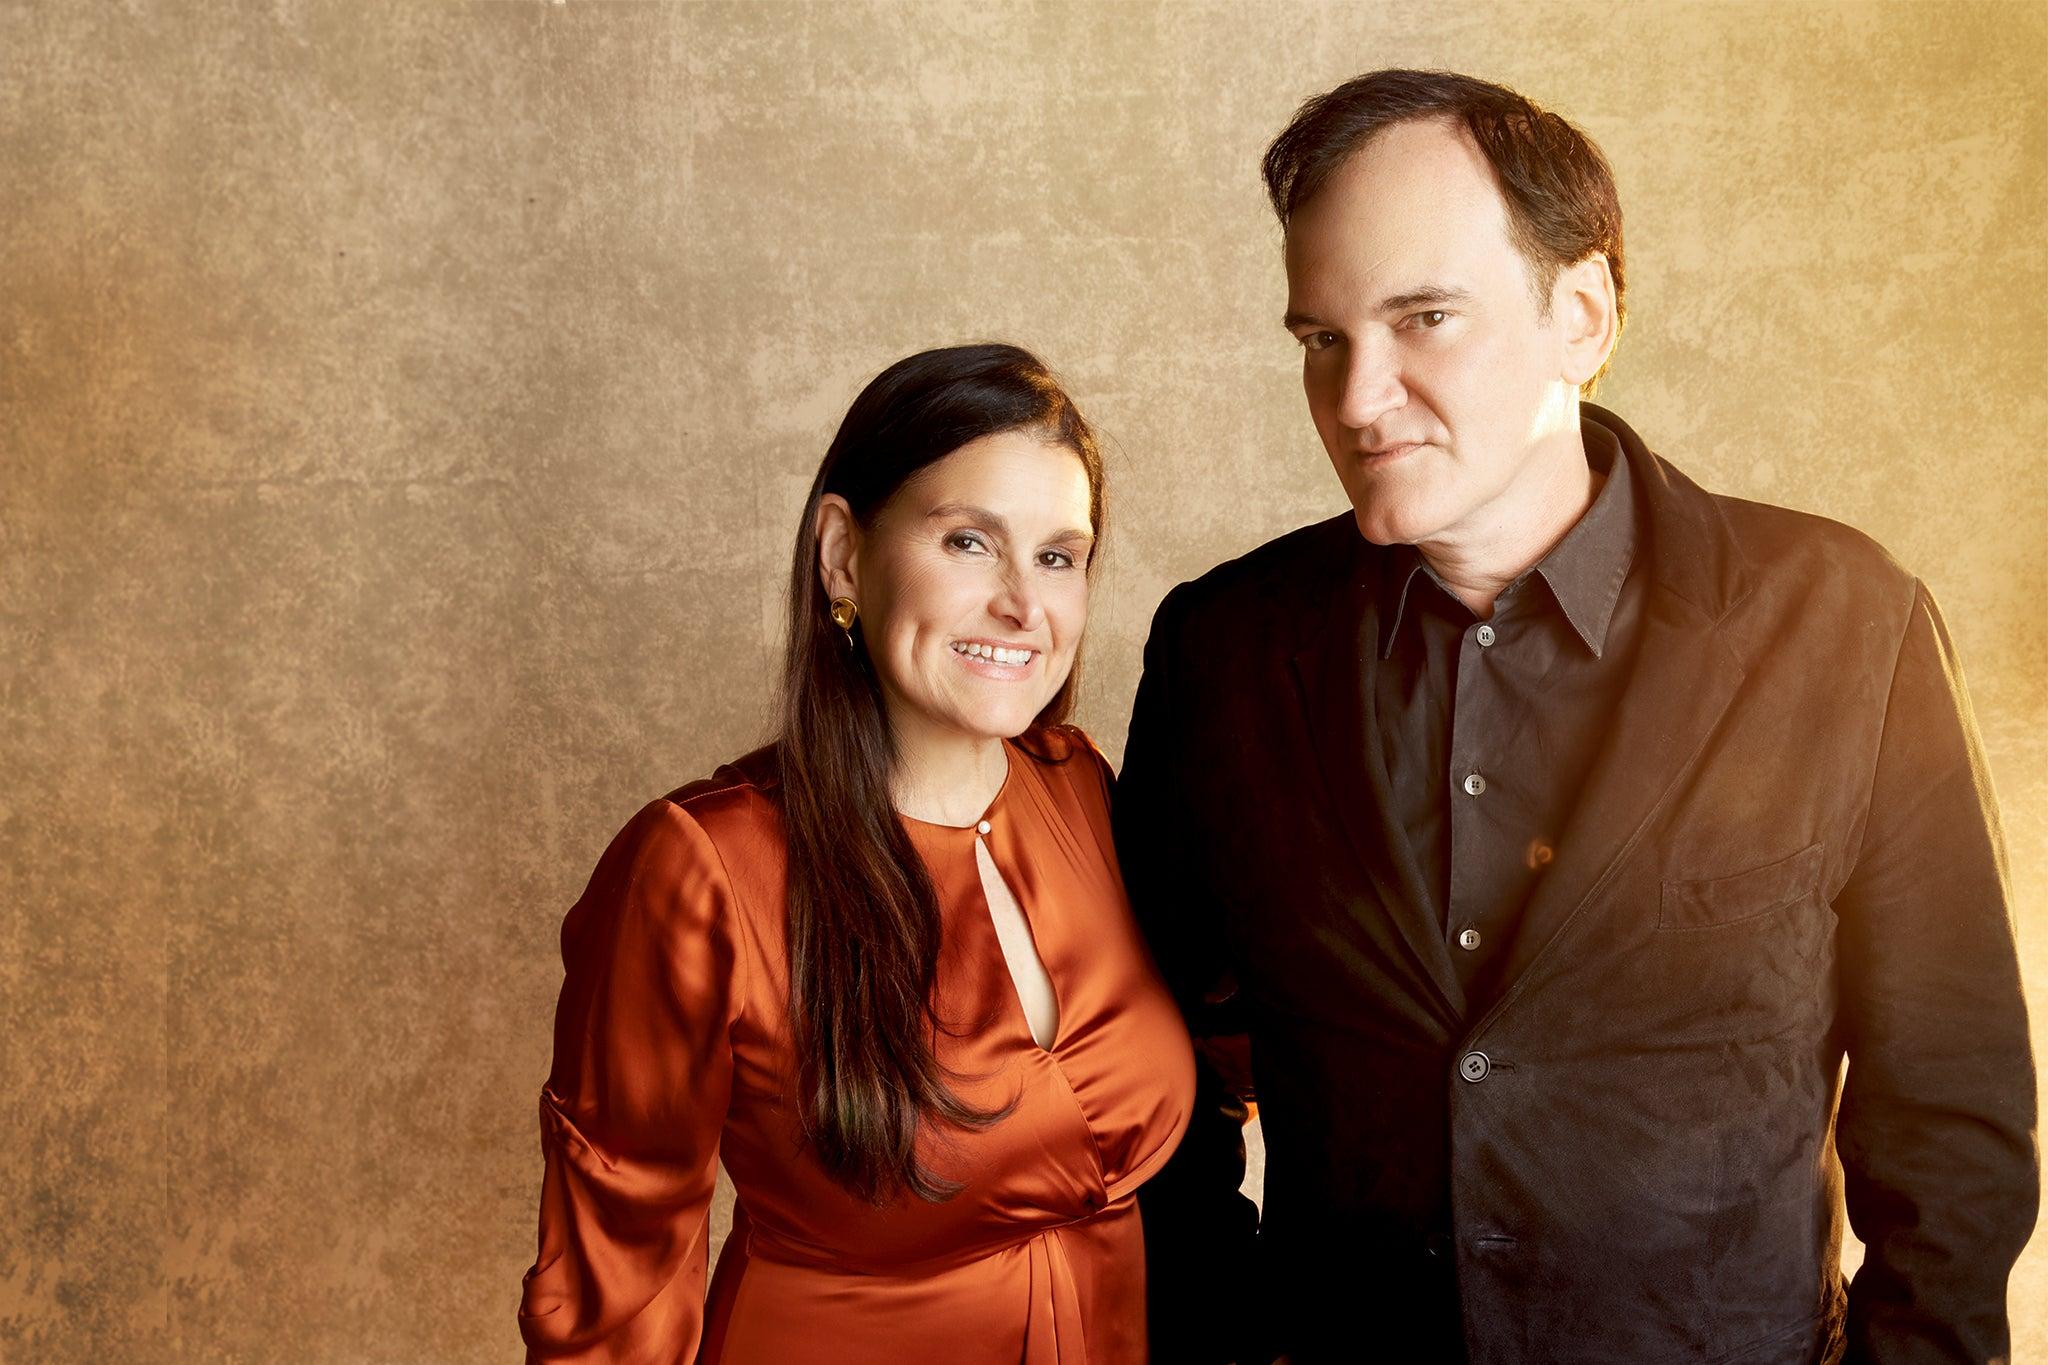 Shannon McIntosh, Quentin Tarantino